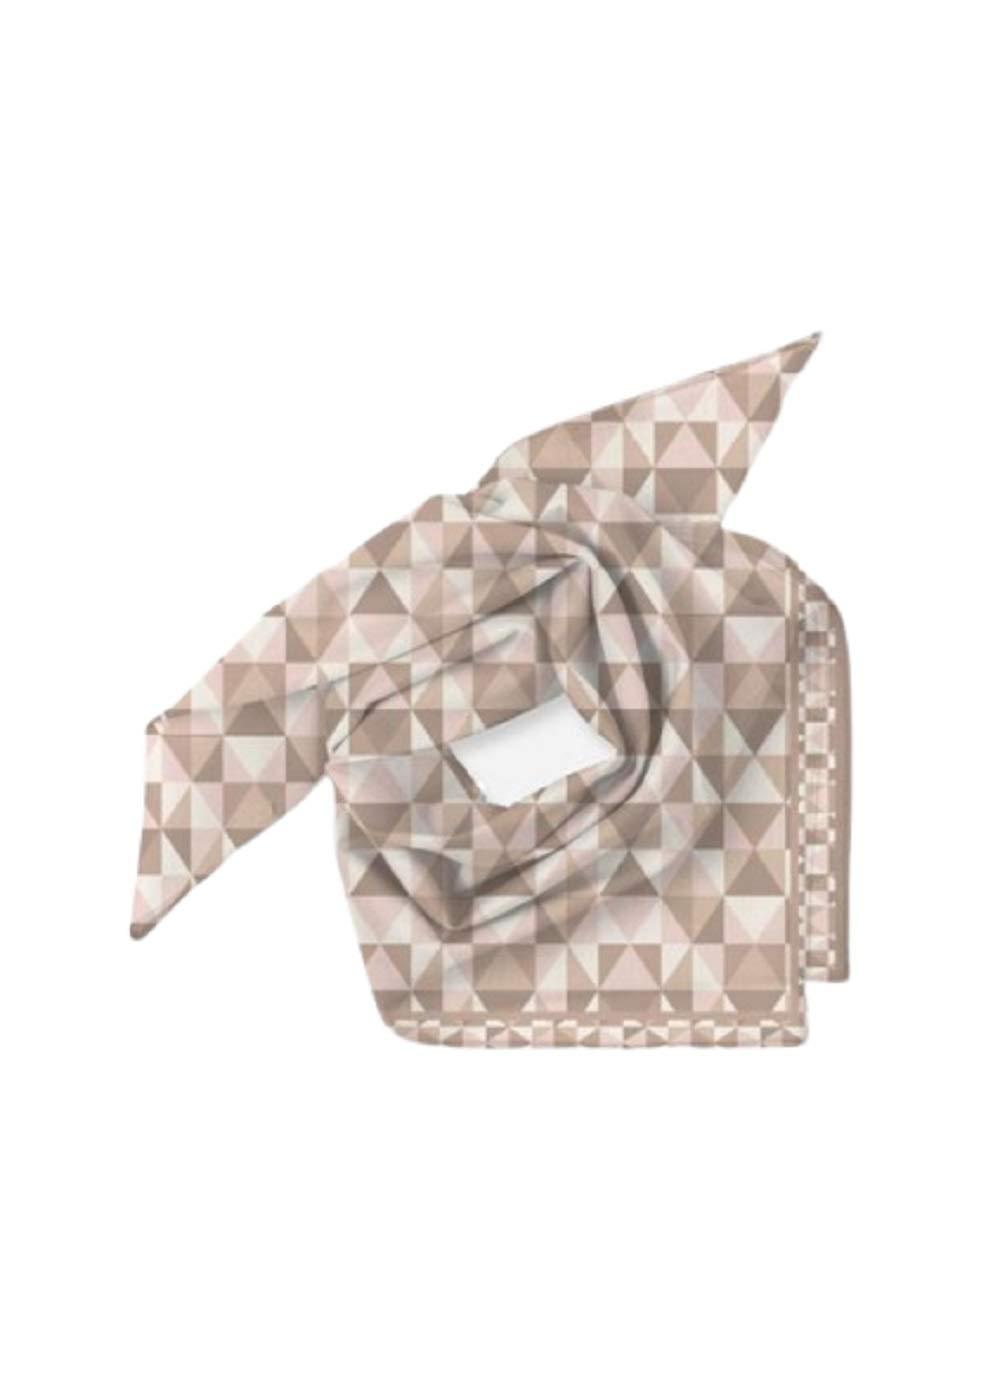 VIDA Modern Diamond Fawn Mini Square Scarf | Original Artwork by Frank Lloyd Wright by VIDA